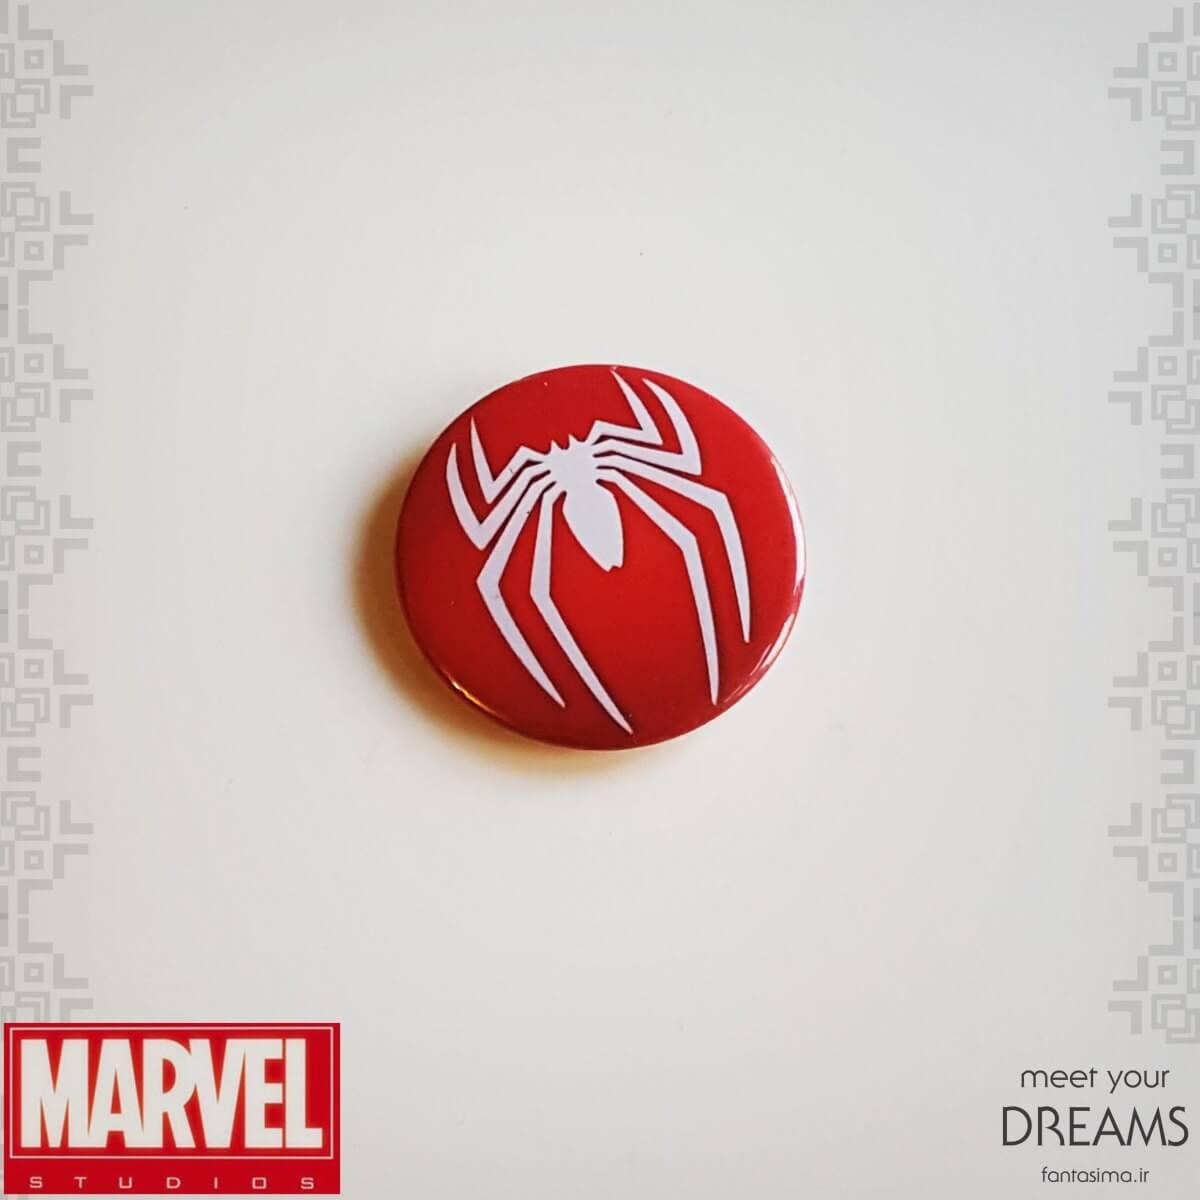 پیکسل فلزی Marvel's spider man